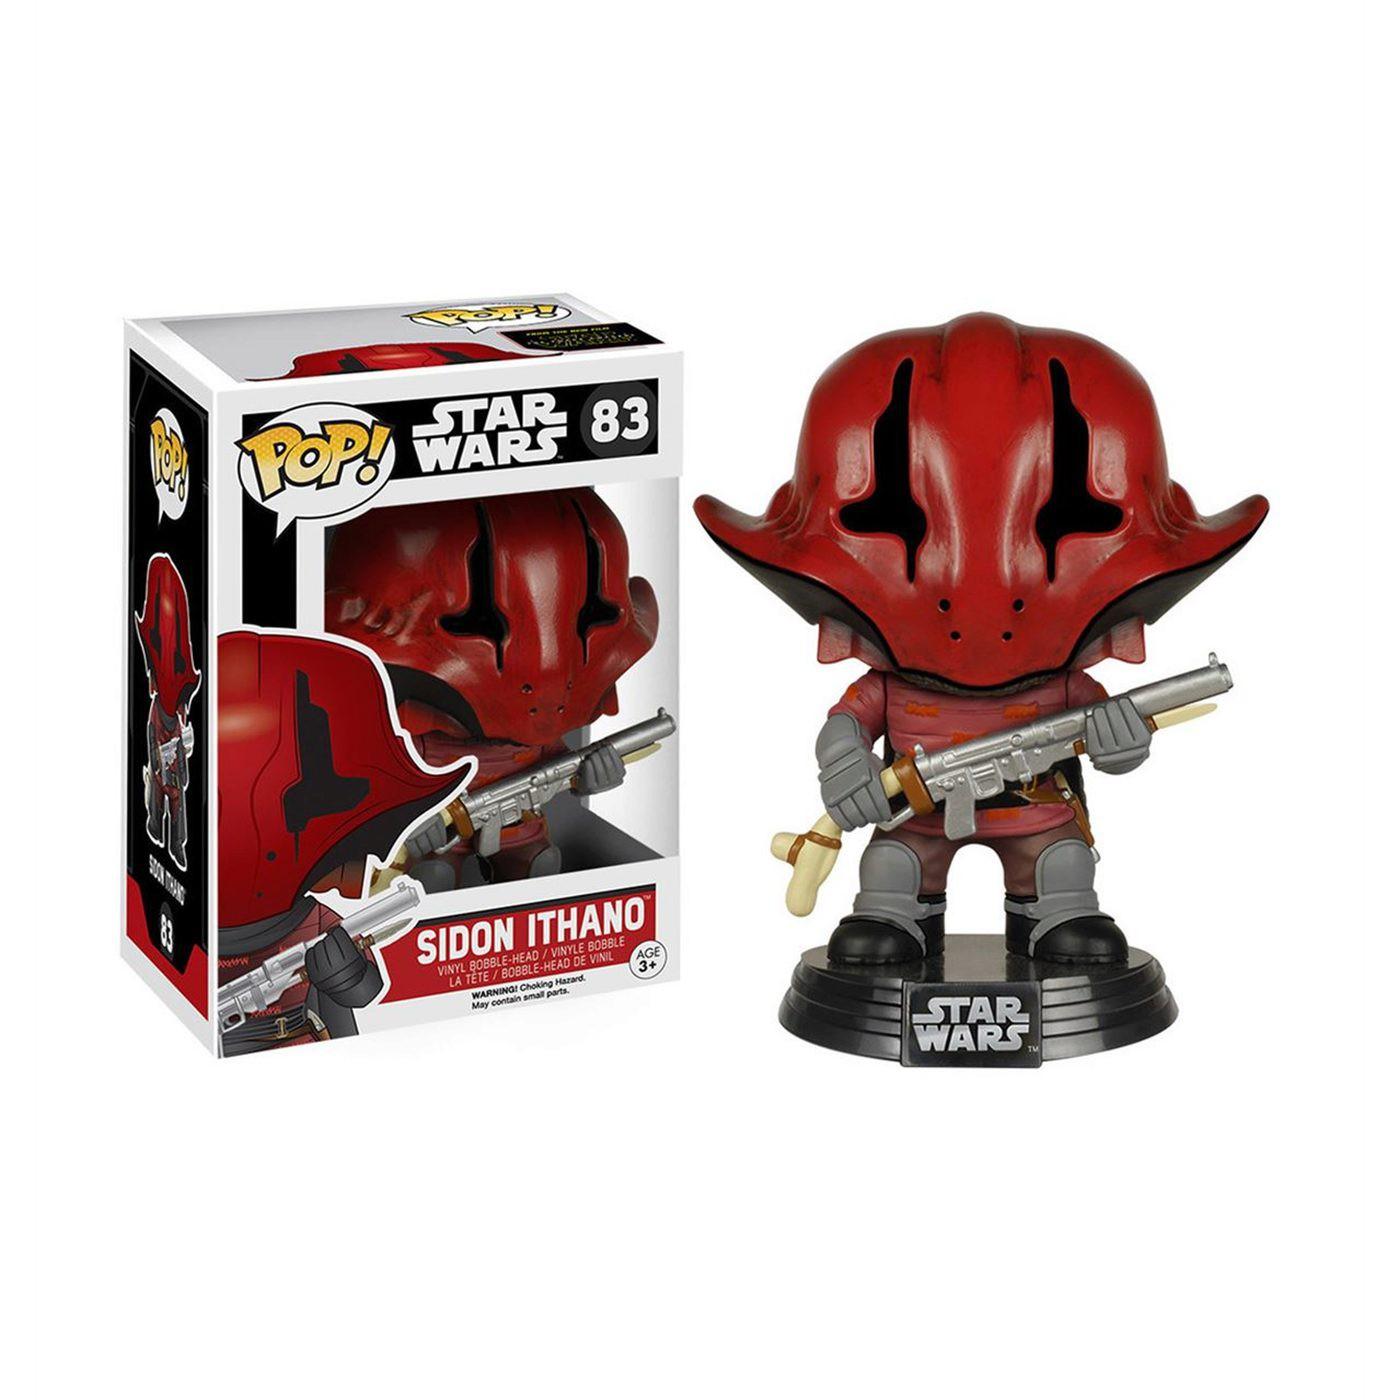 Star Wars The Force Awakens Sidon Ithano Pop Bobblehead